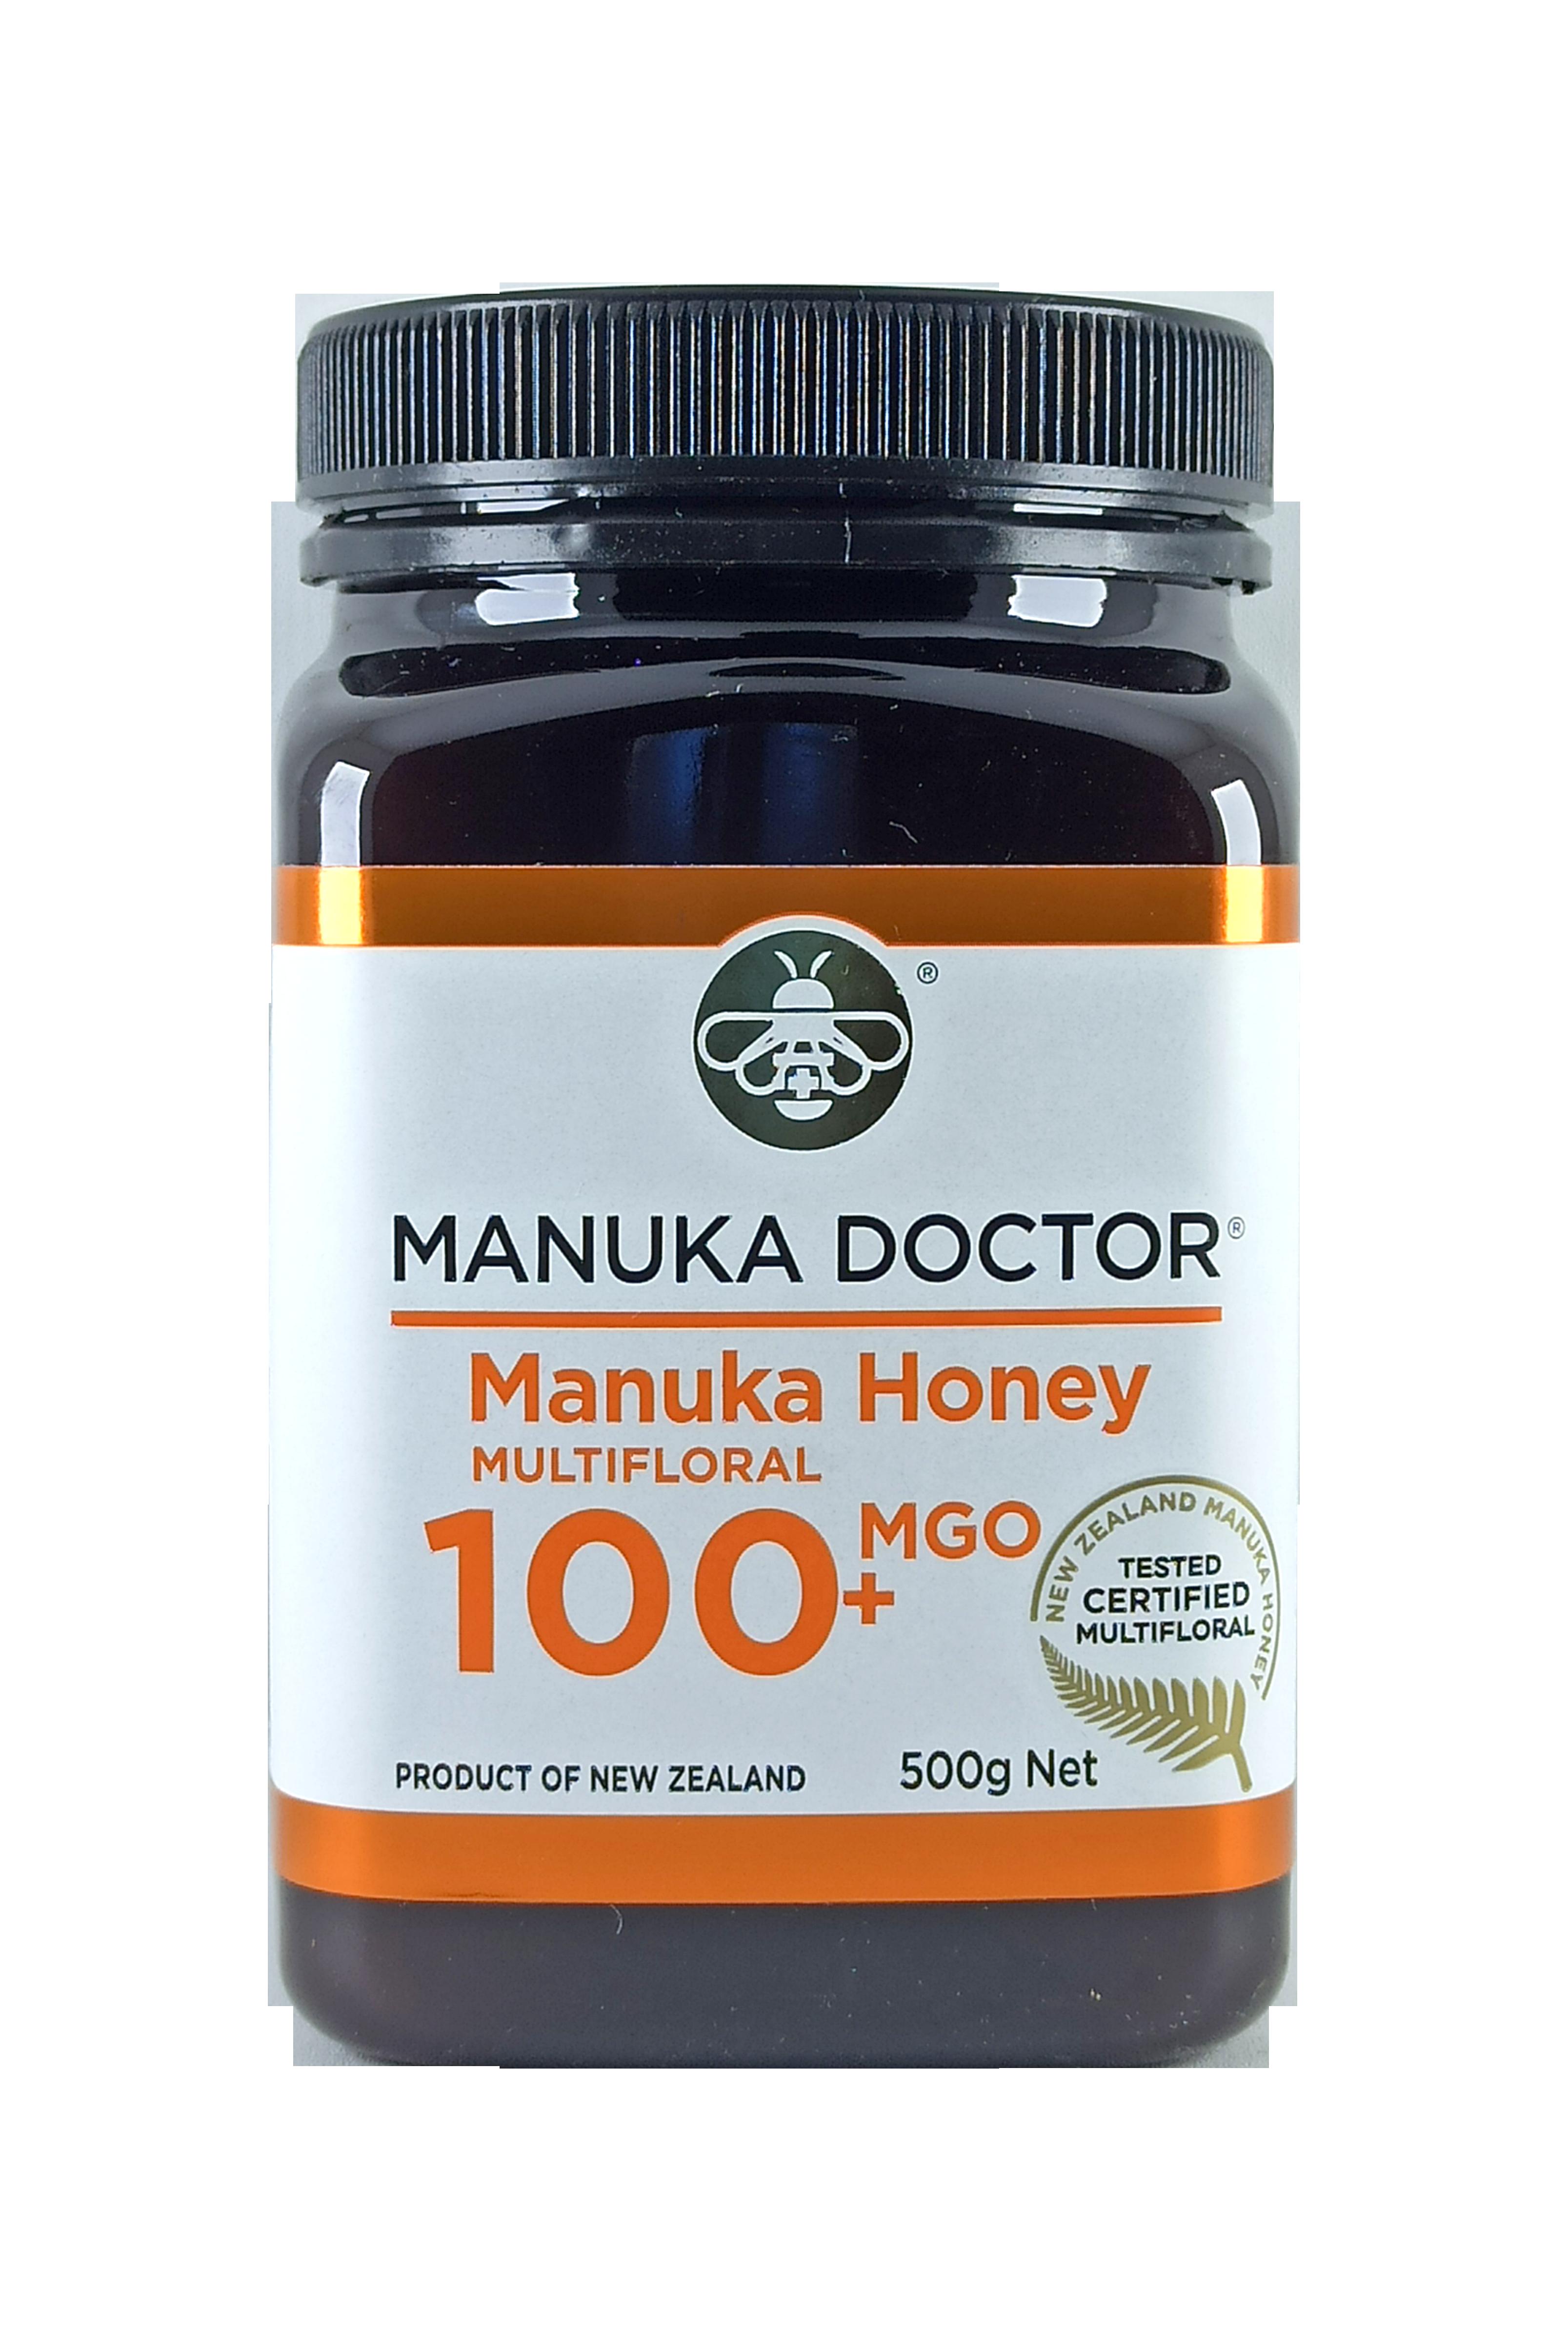 Manuka Doctor MGO 100+ Manuka Honey Multifloral 500gr